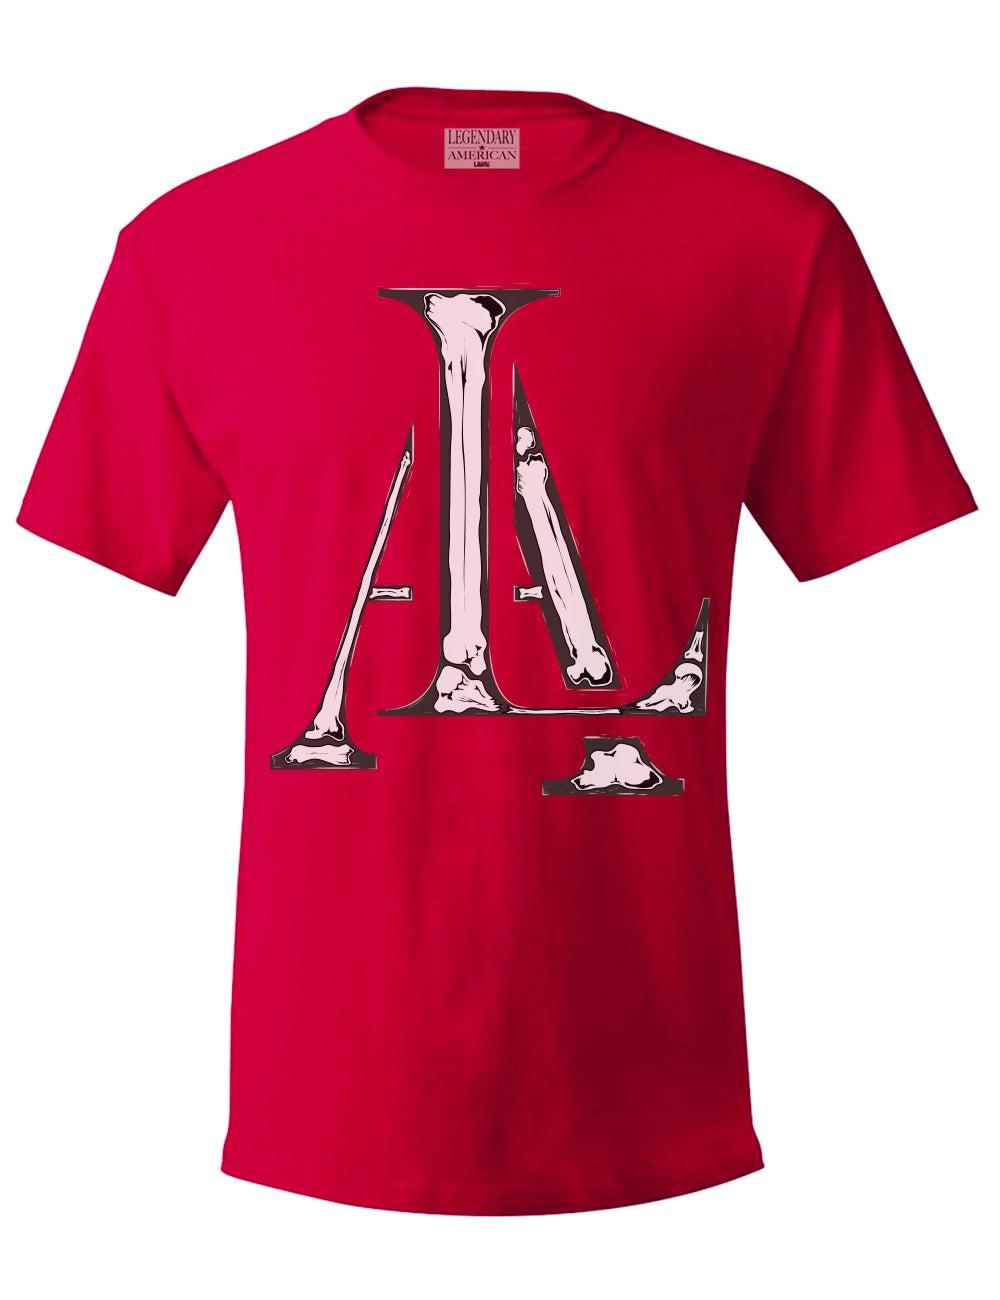 Image of Legendary American LA Bones tee in red